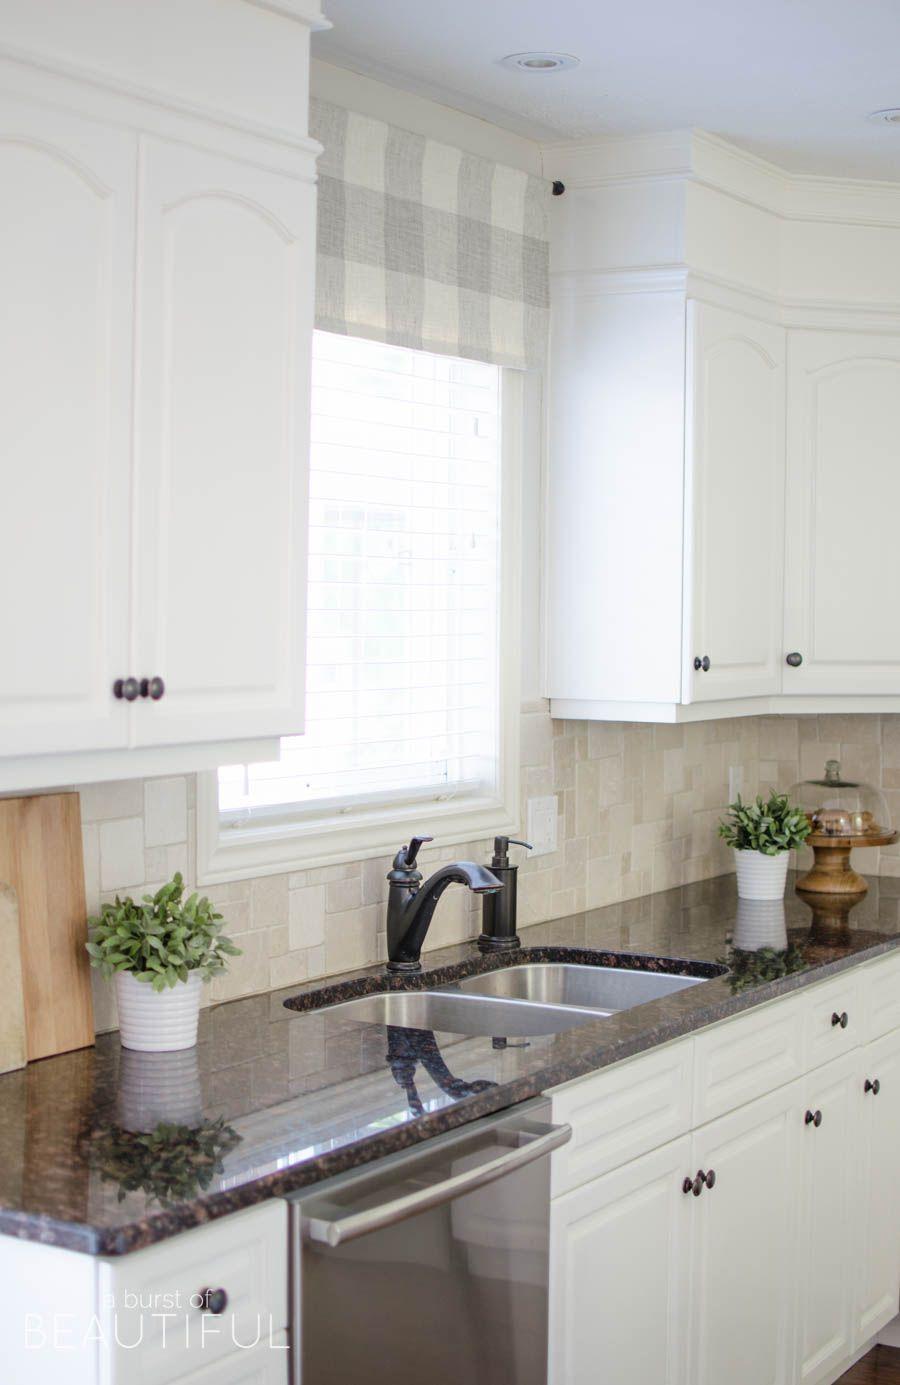 Farmhouse Kitchen Window Valance Tutorial | Buffalo check fabric ...